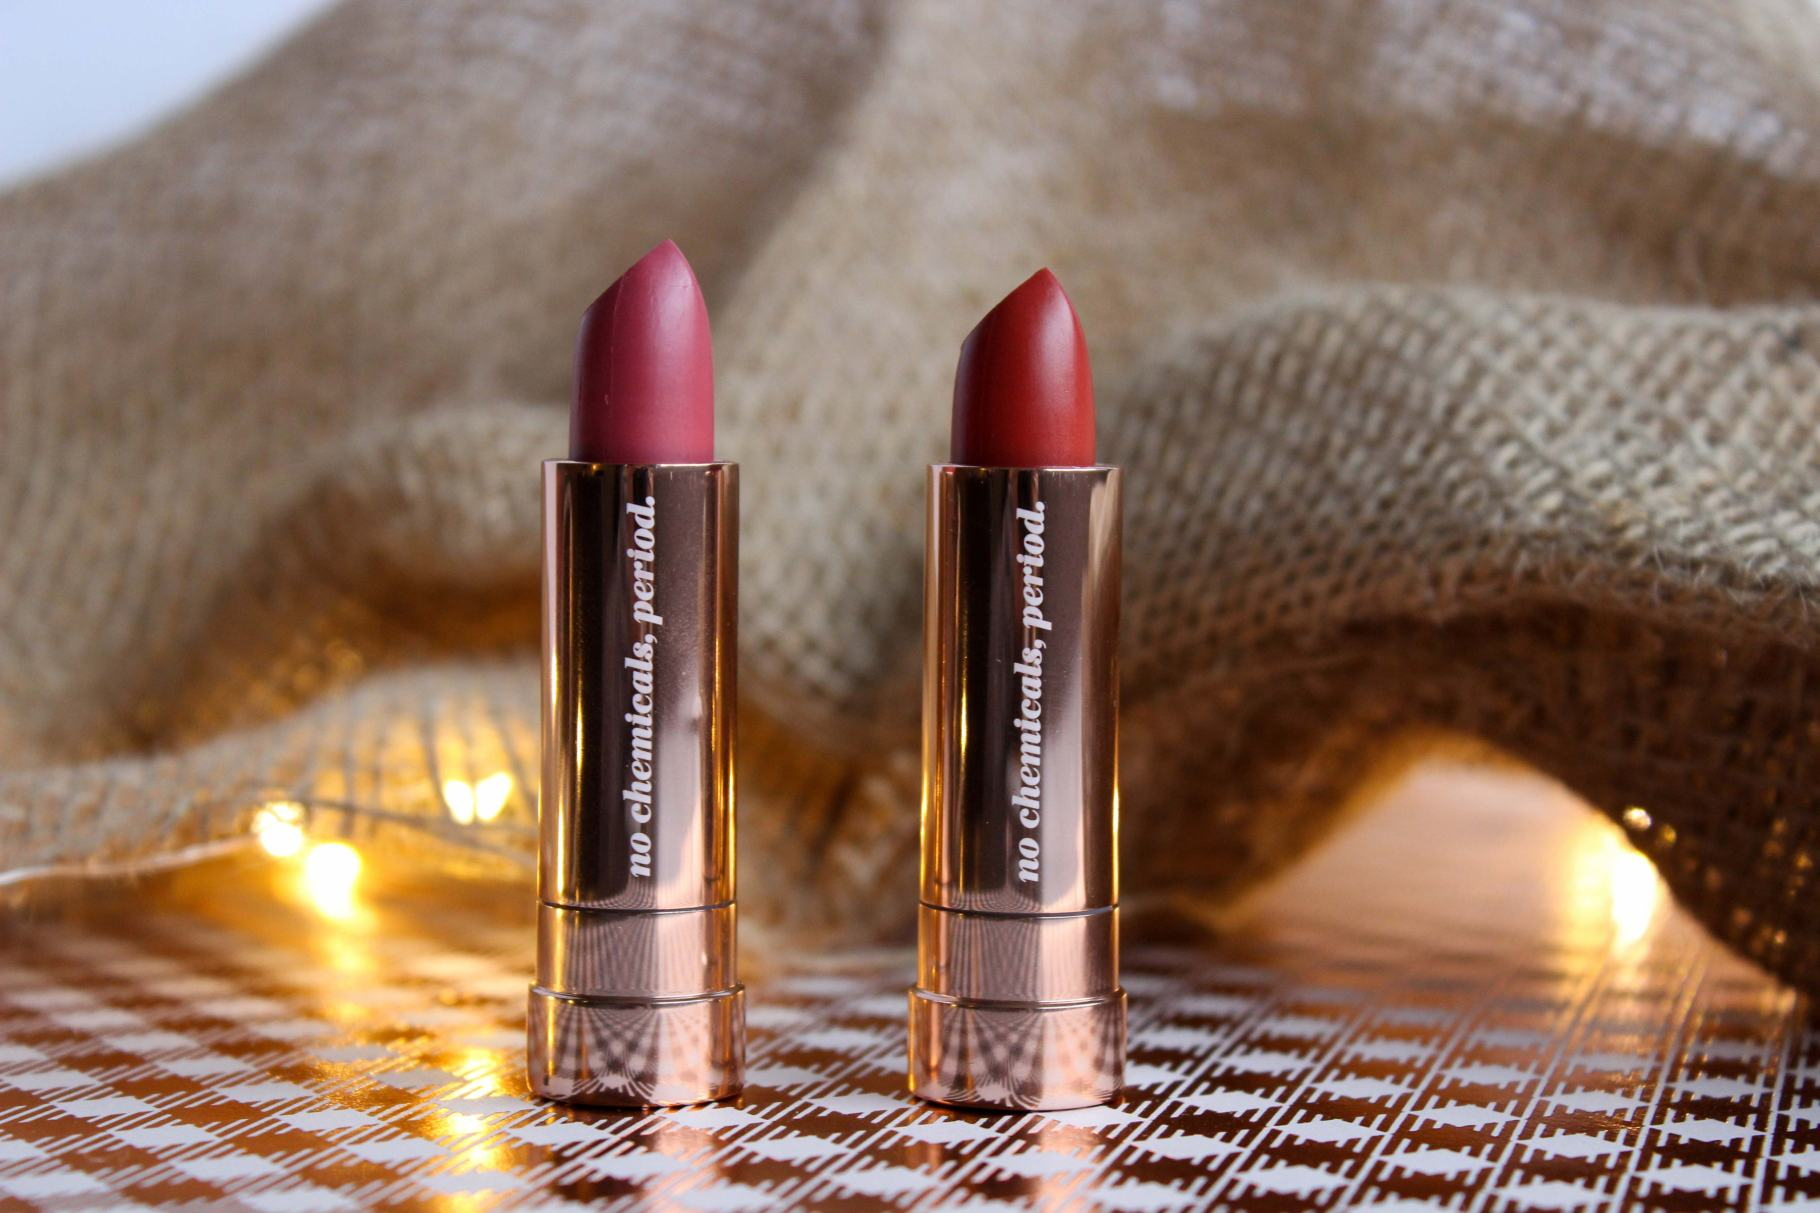 Boosh Natural Lipstick Review